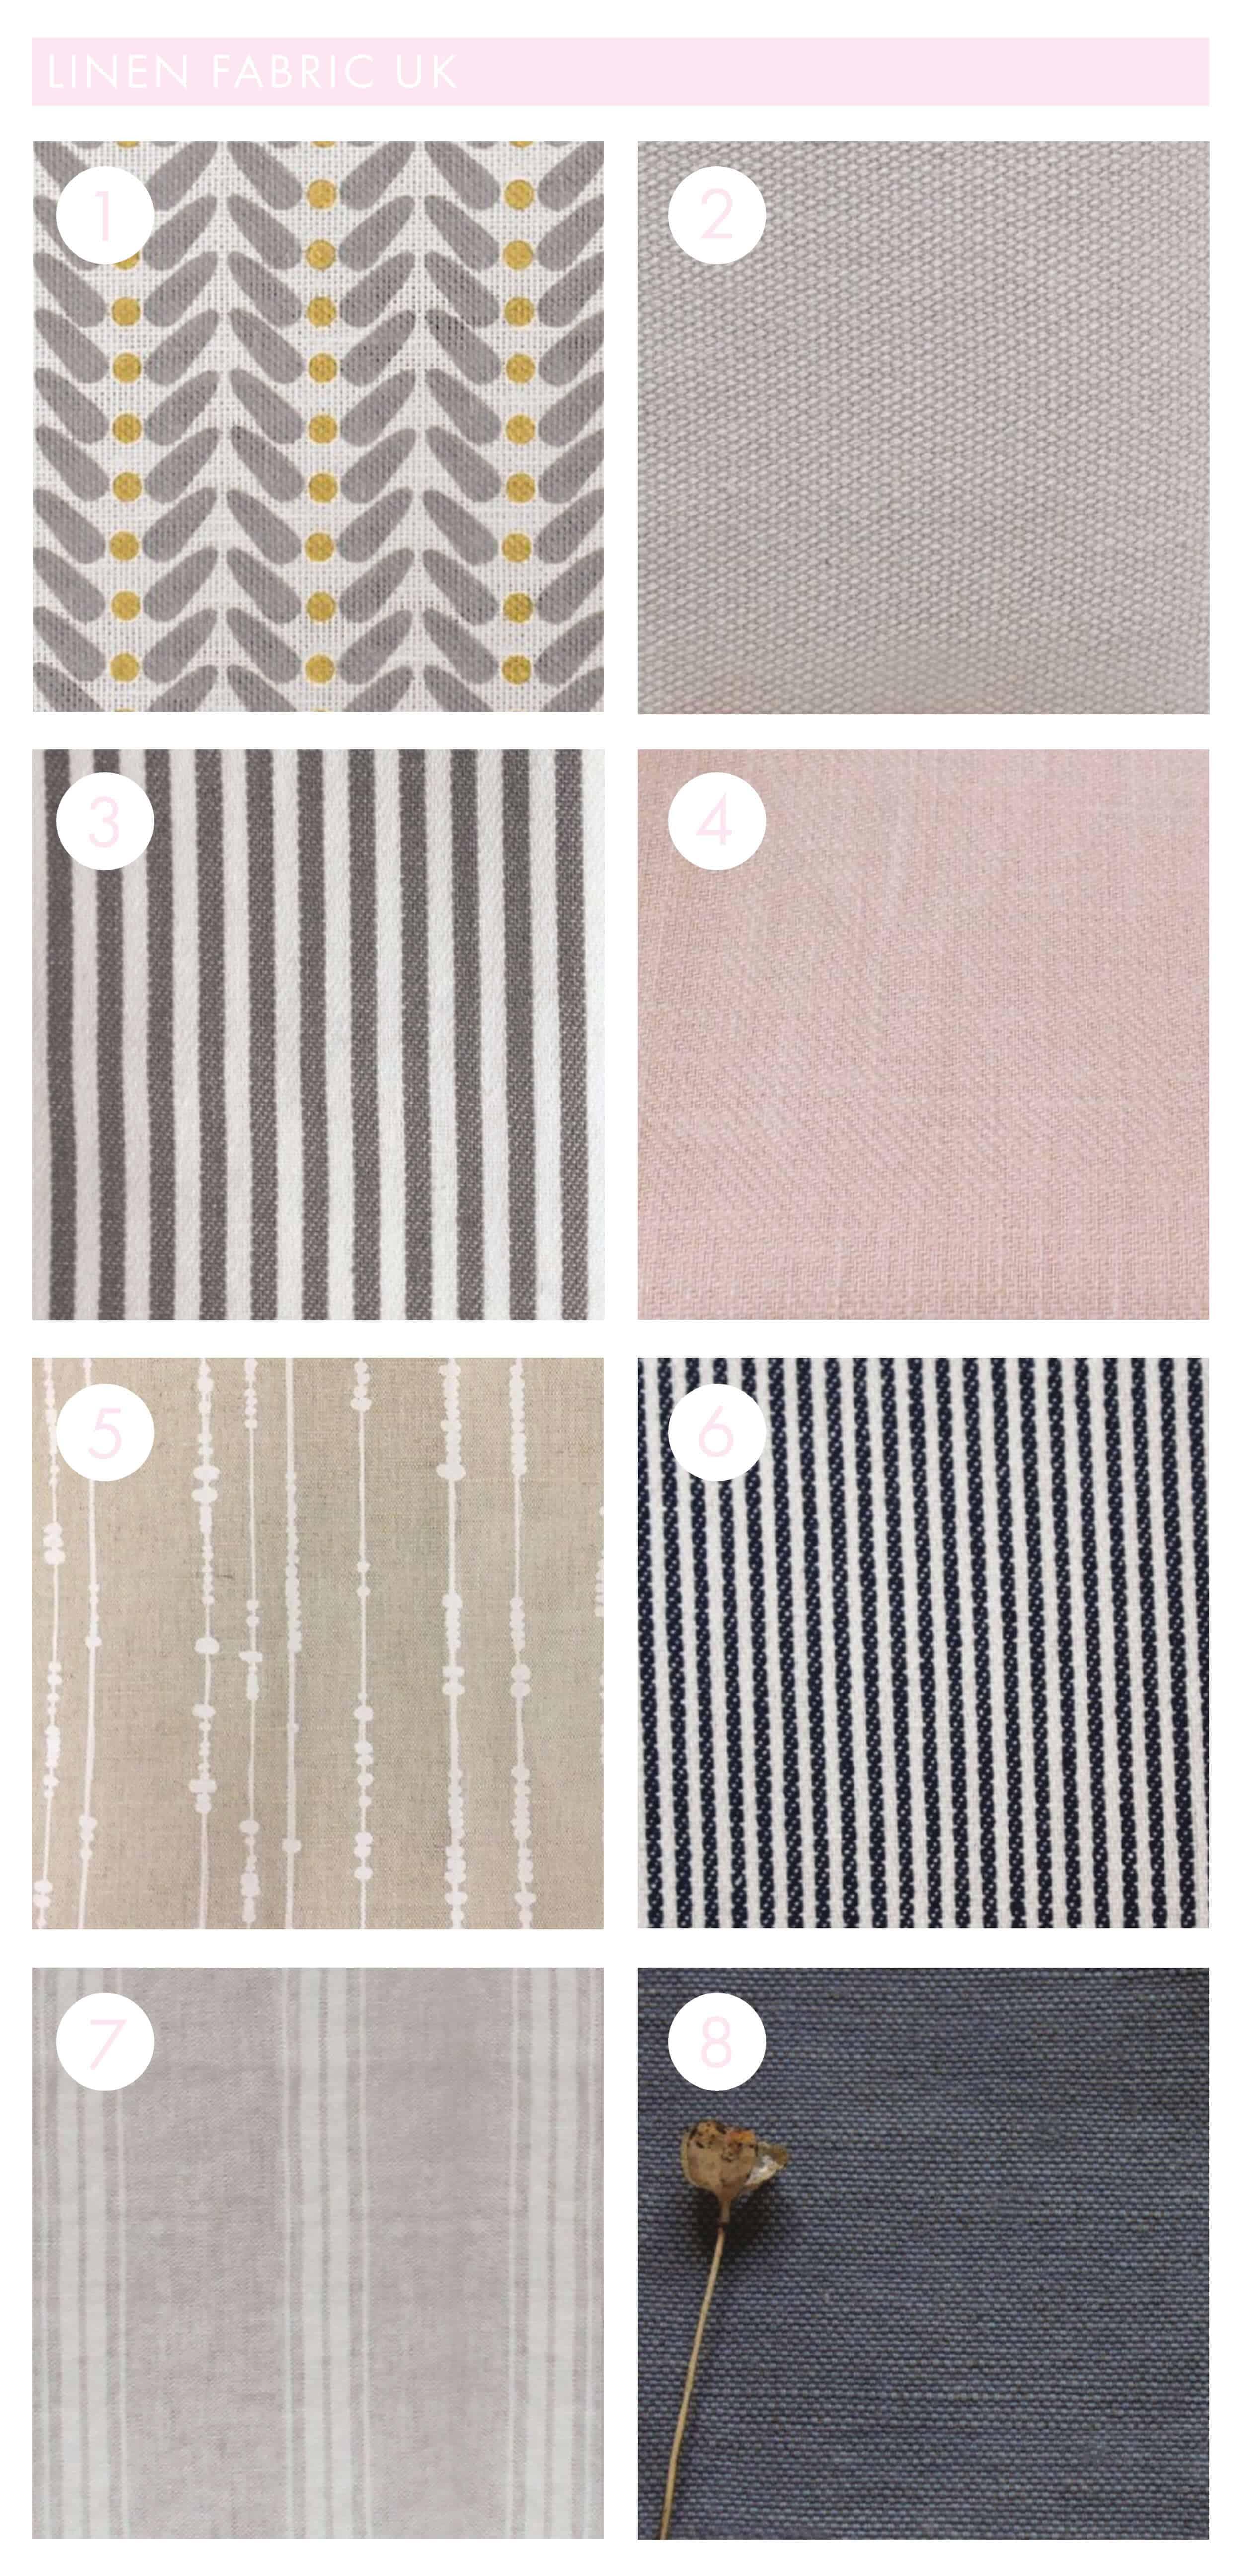 Linen Fabric Uk 2017